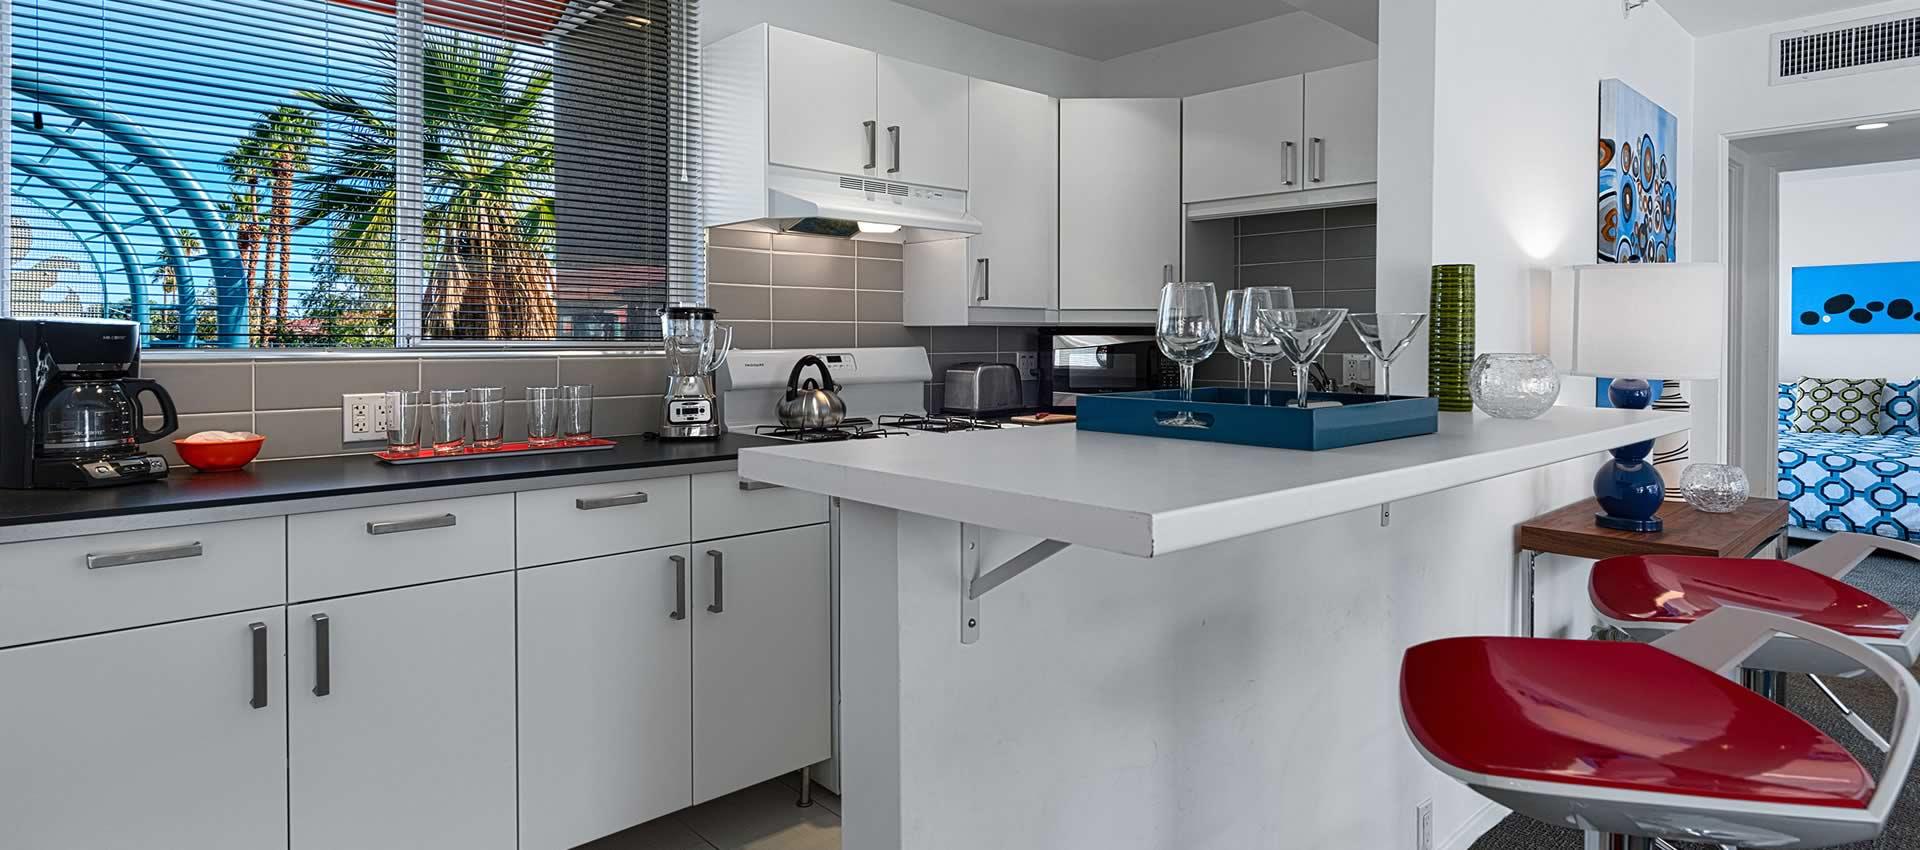 the kitchen of twist hotel room 218